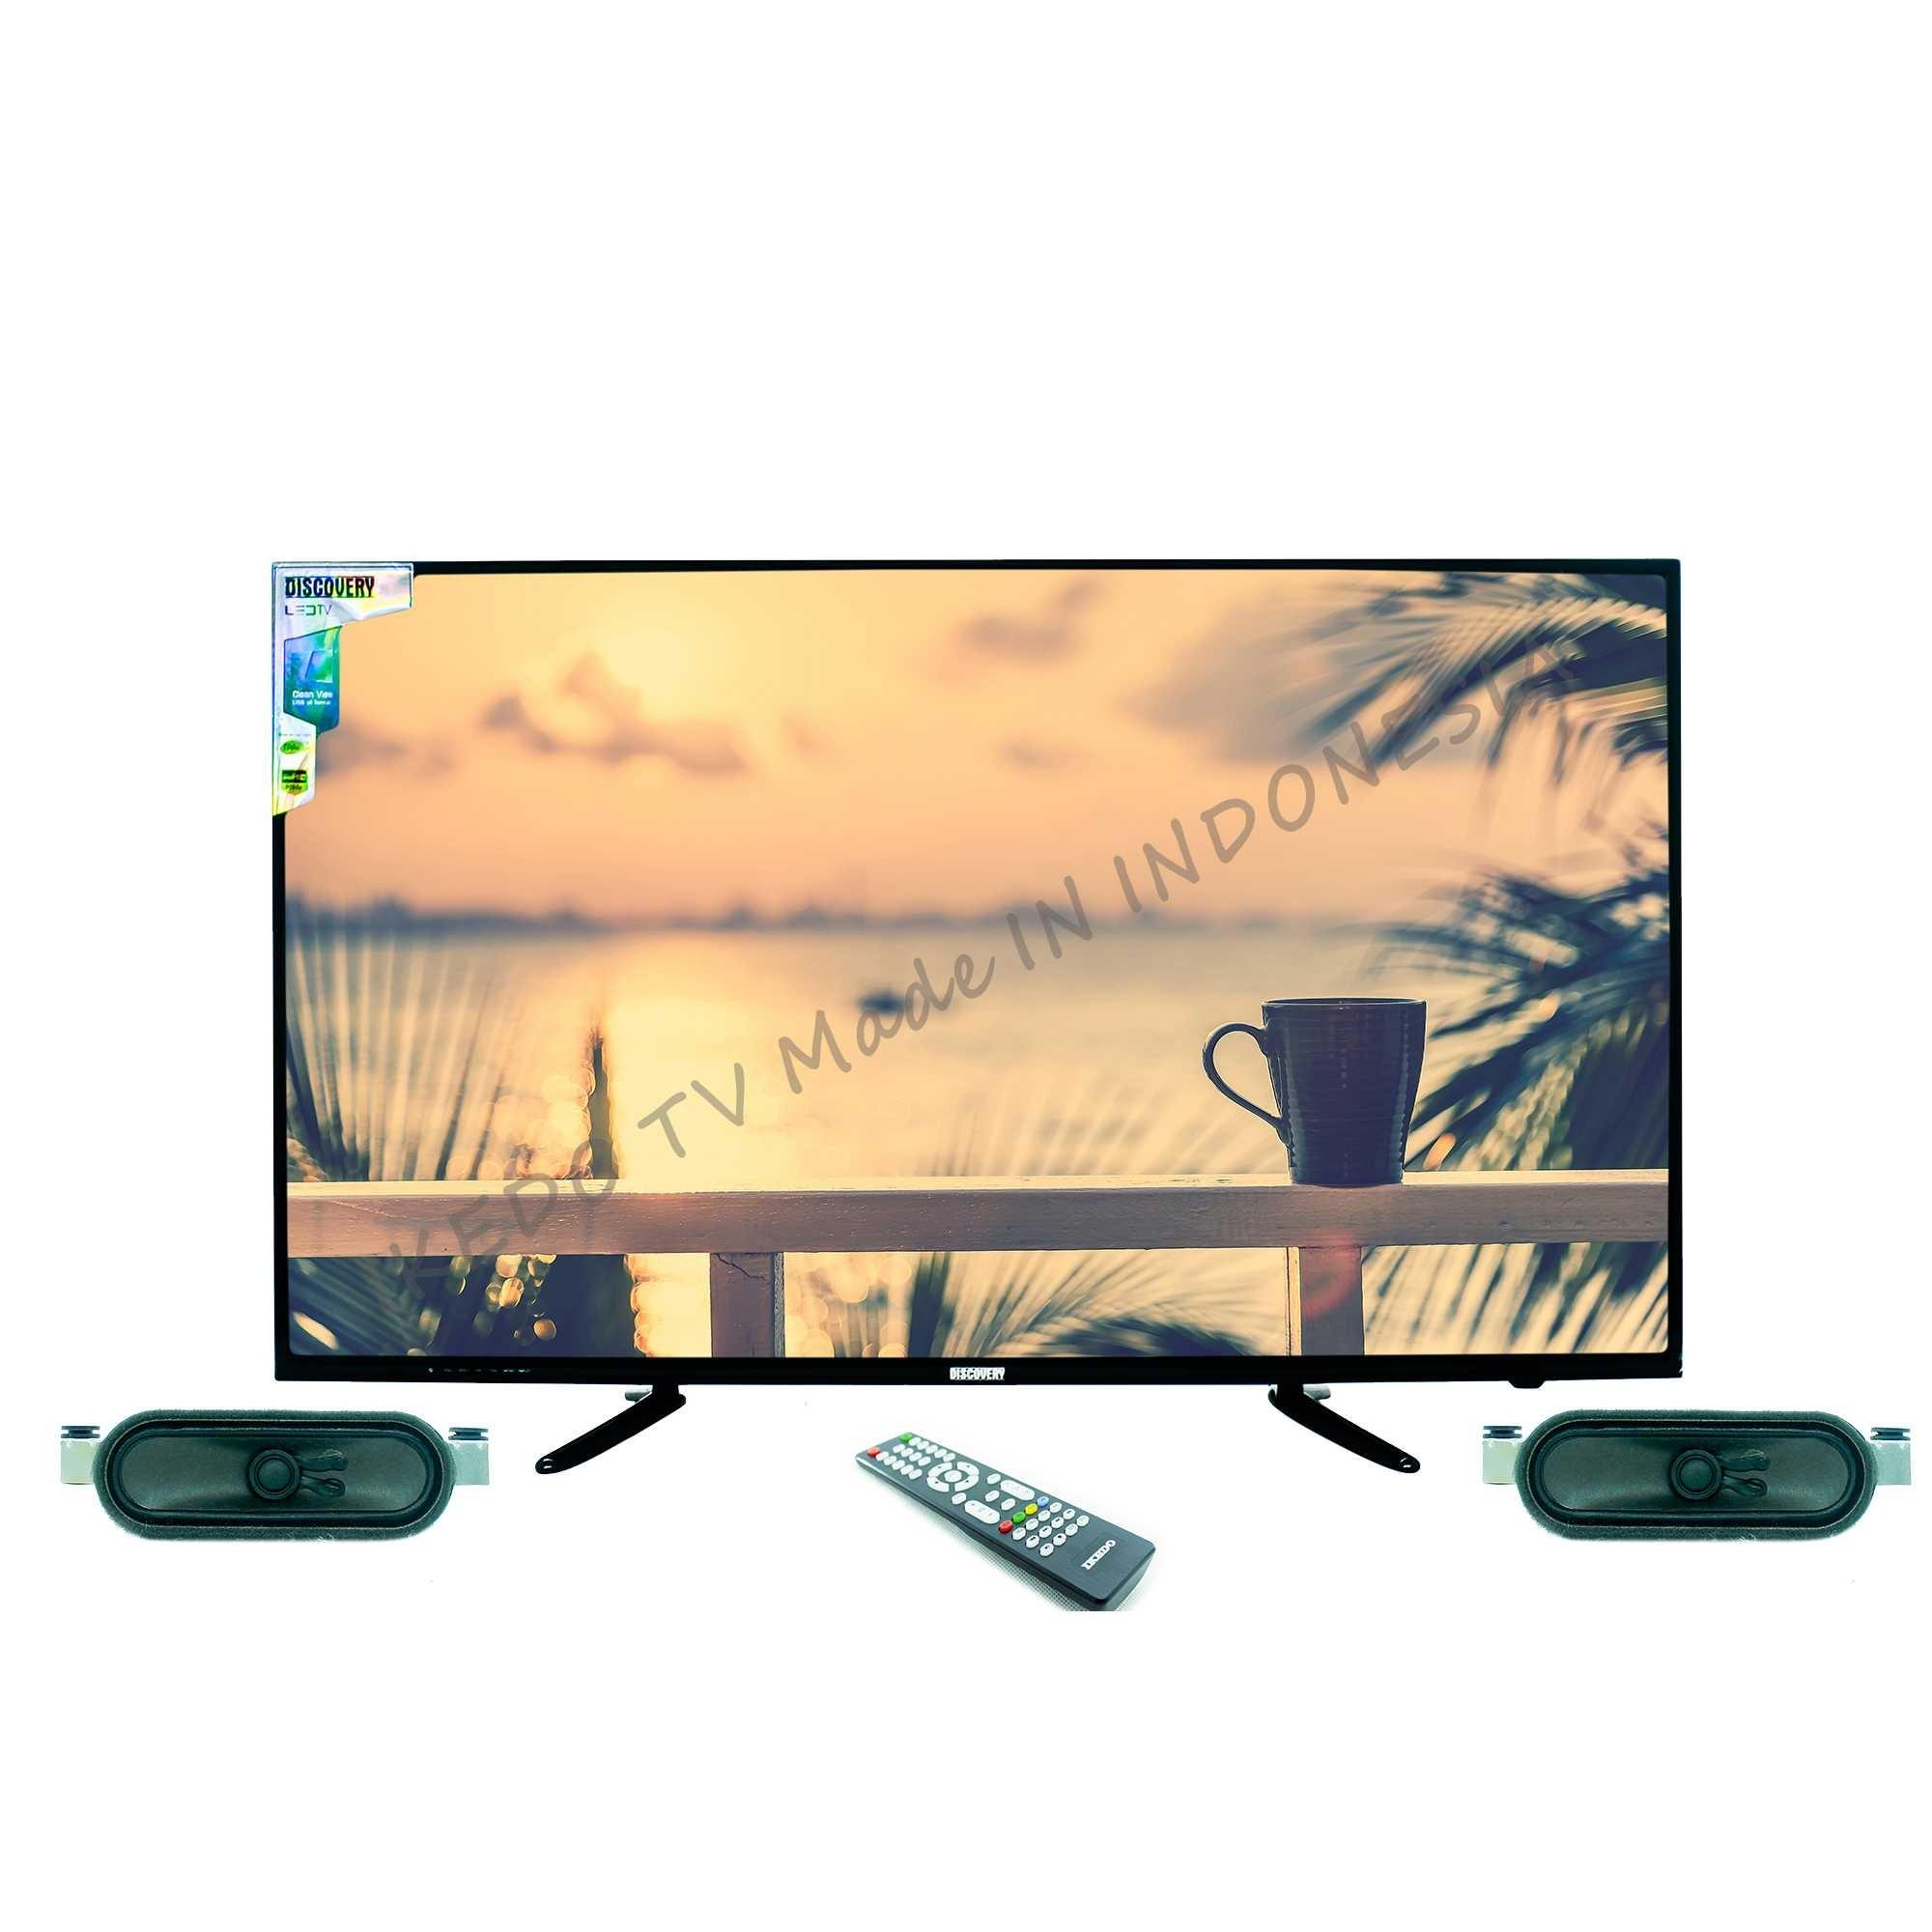 LED TV IKEDO LT 50U ISB DISCOVERY HITAM